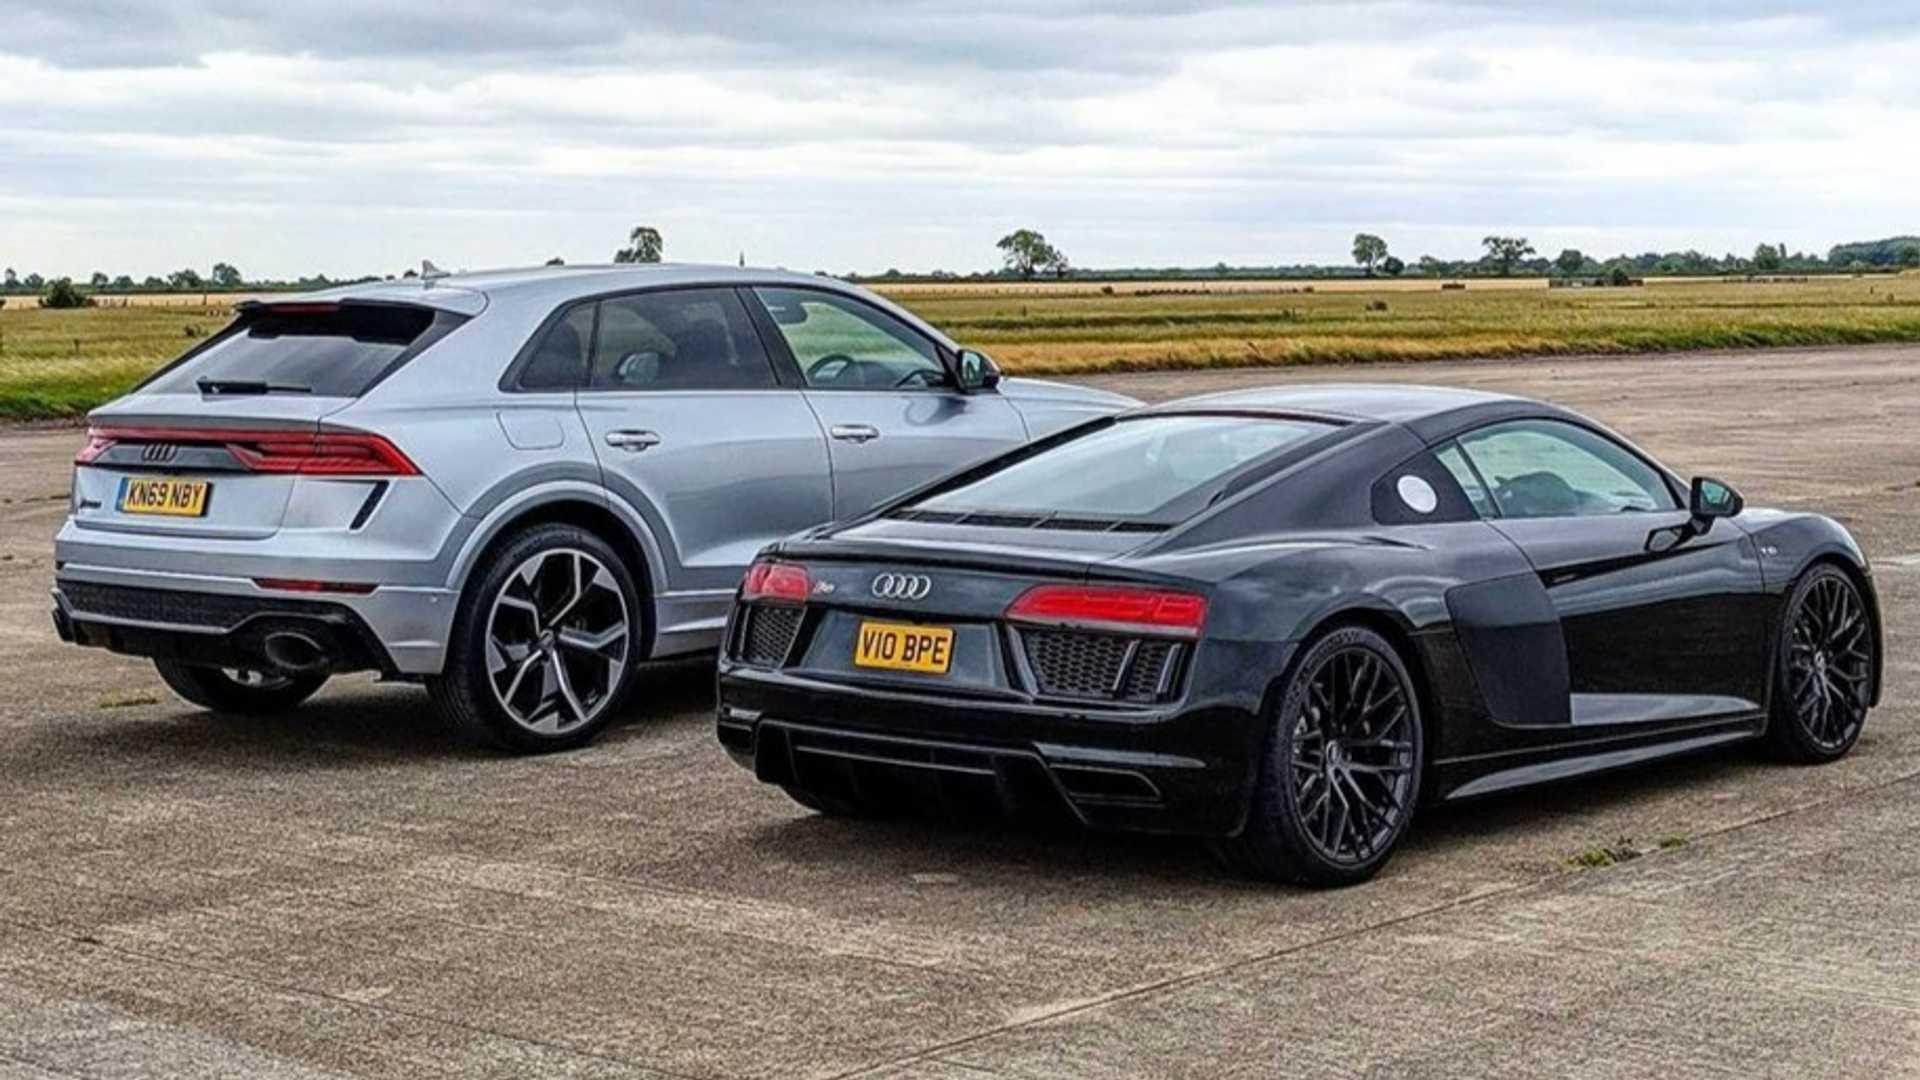 Audi RS Q8 vs. Audi R8 V10